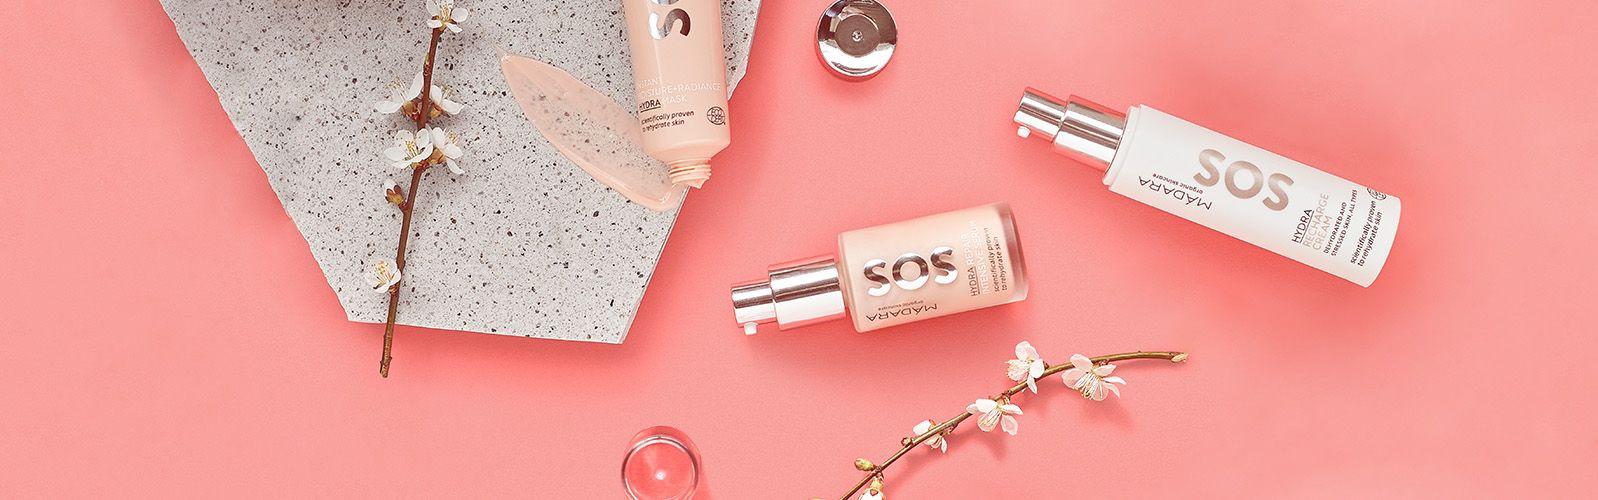 Madara Skincare